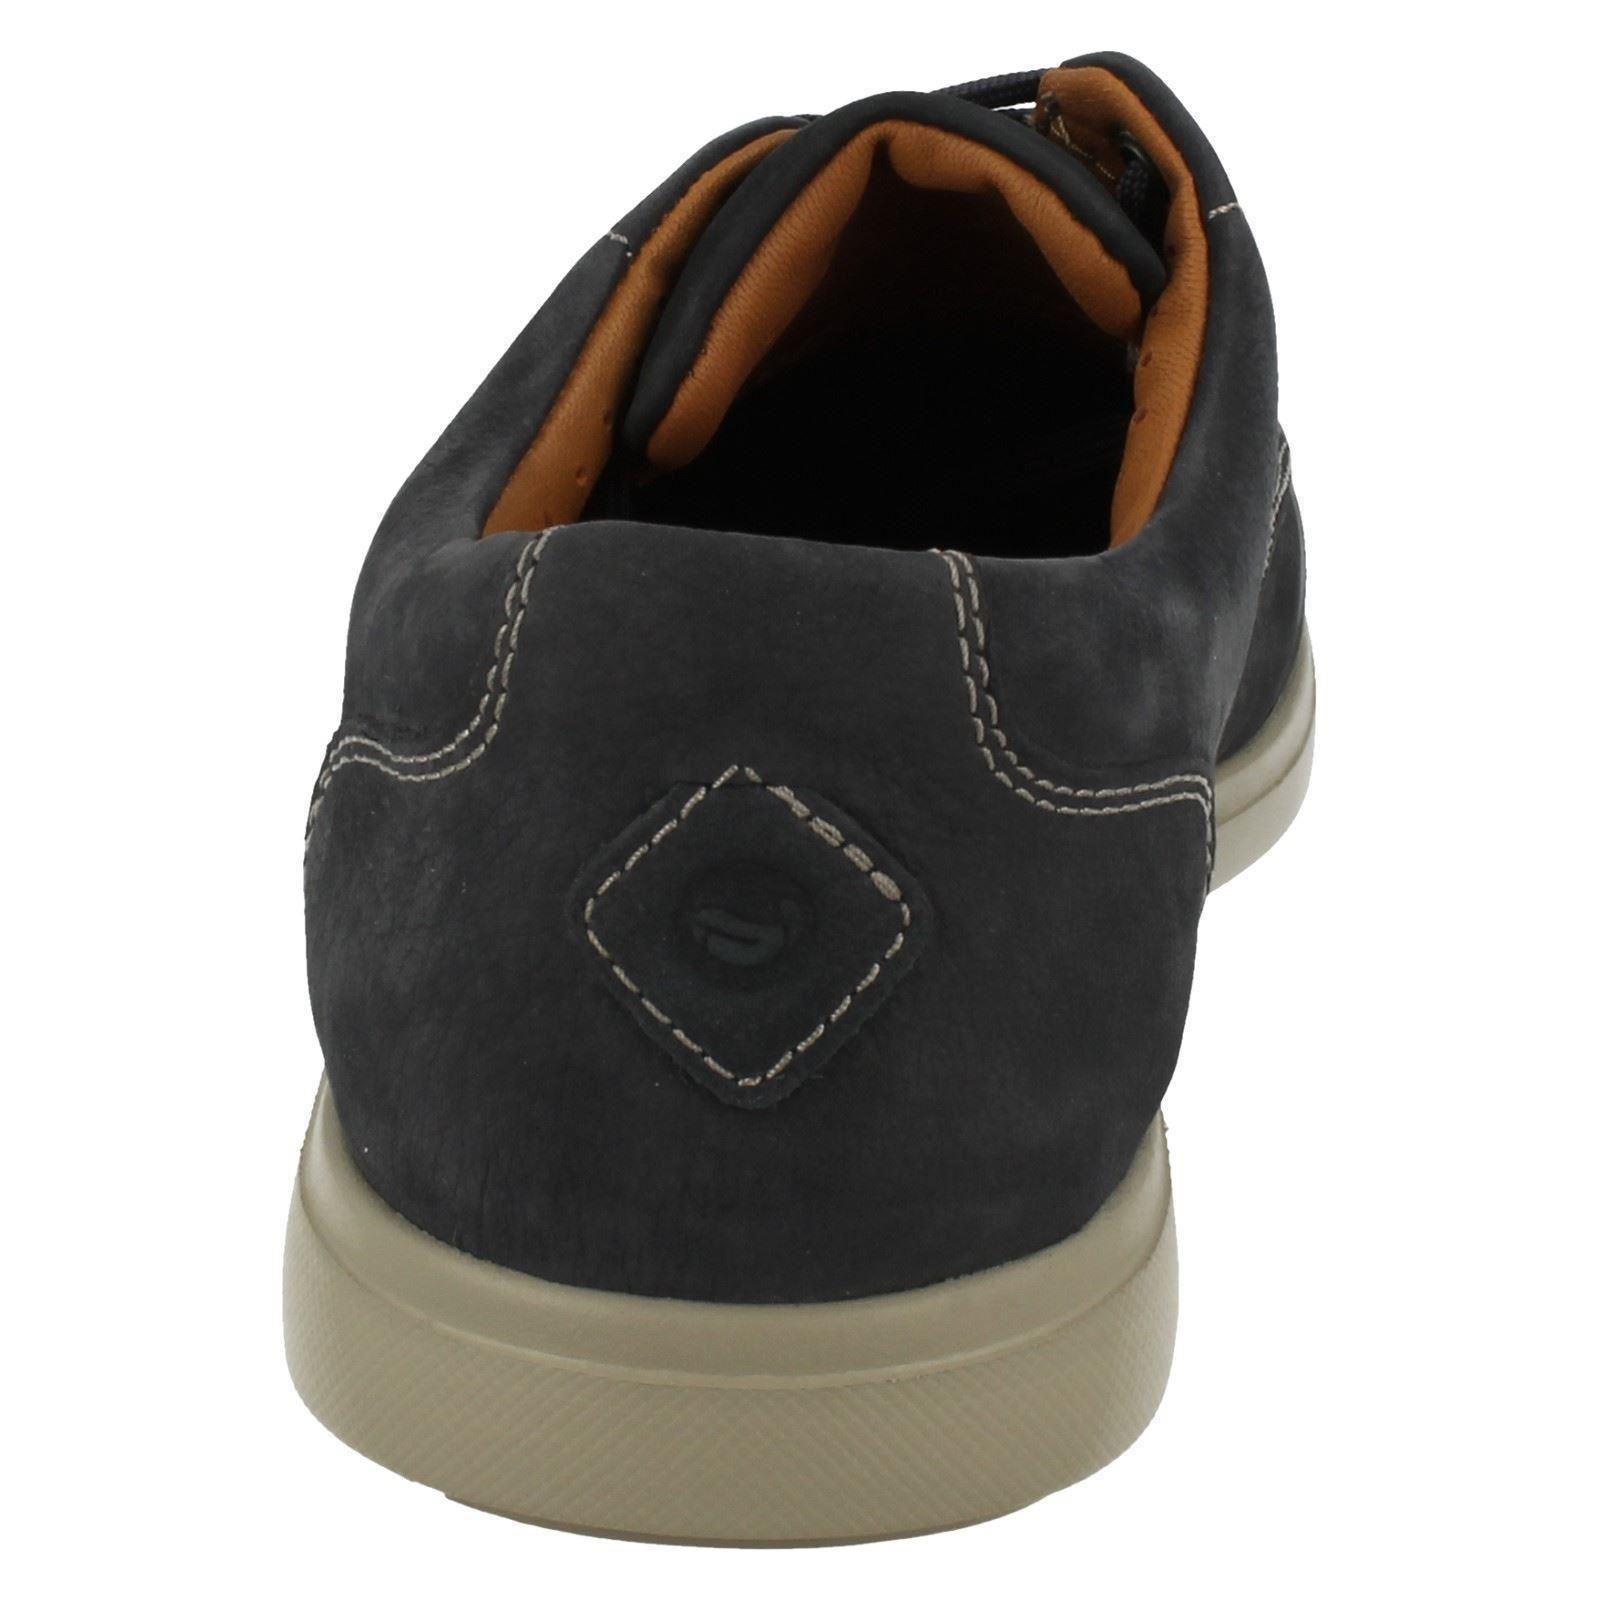 ' Clarks Estructura Con Hombre Edge Casual Zapatos Sin Unlomac Cordones 0cBZZdnqW